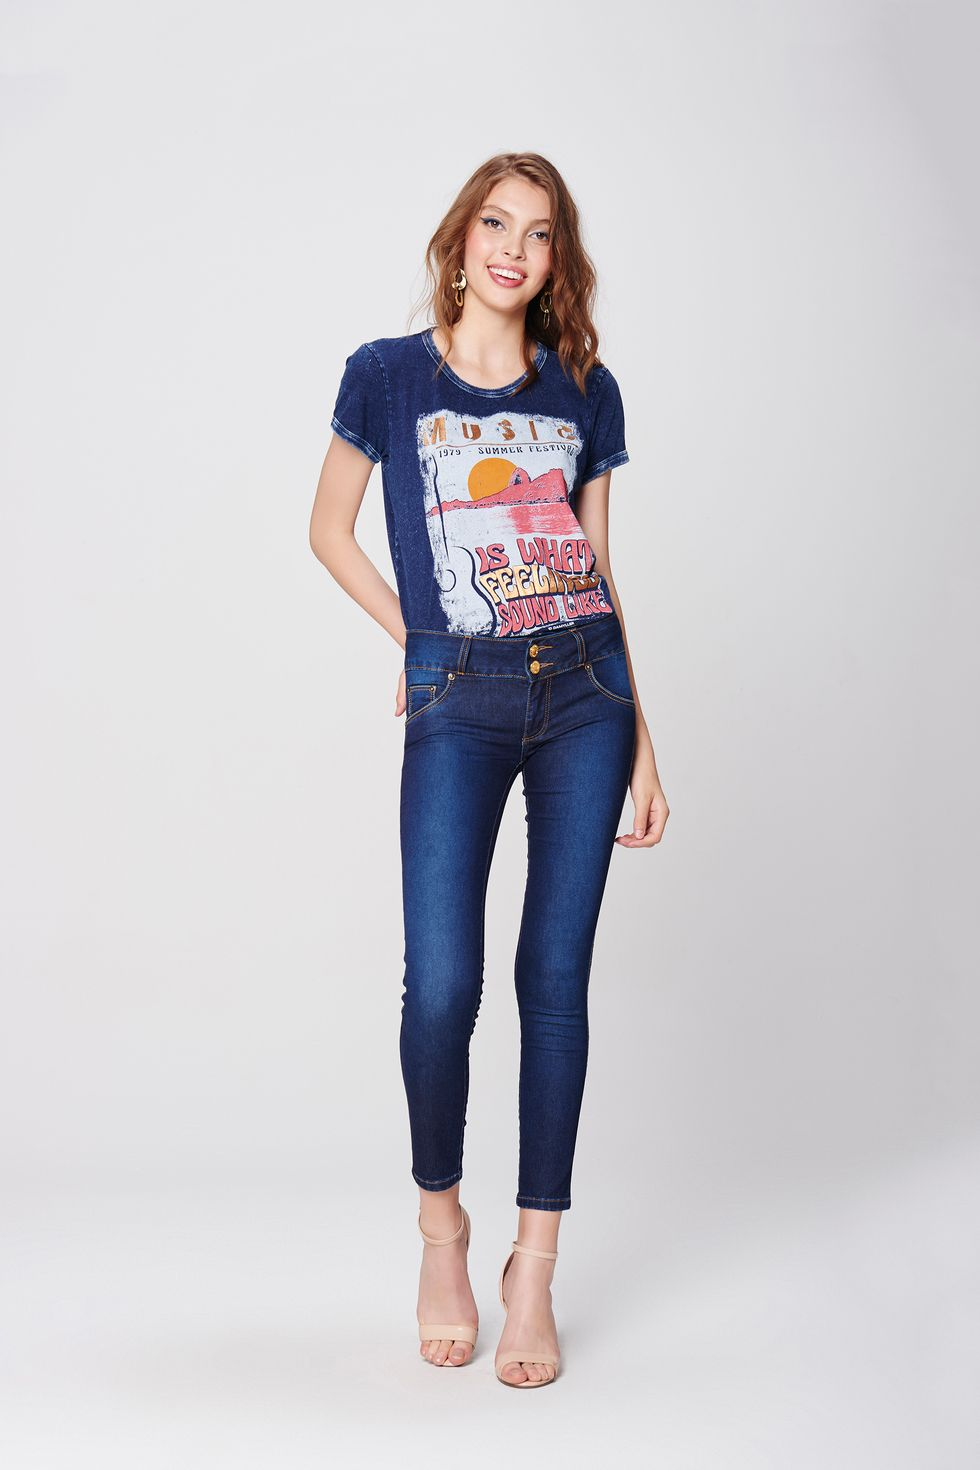 Calca-Jeans-Jegging-Cropped-Up-Feminina-Frente--